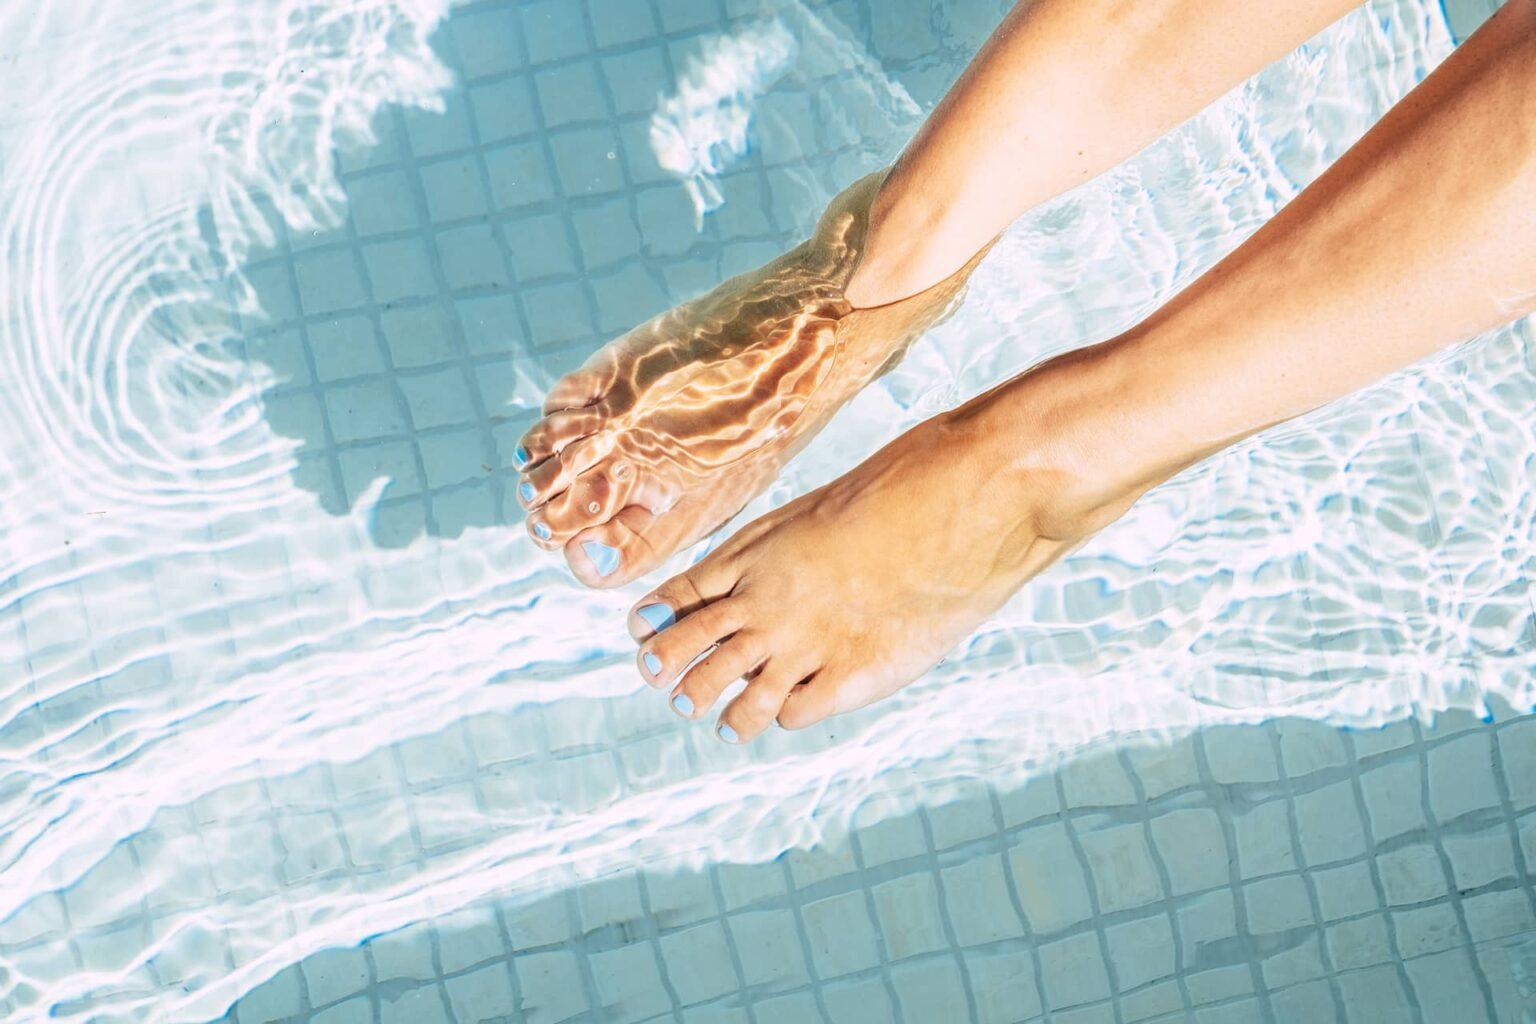 close-up-of-woman-caucasian-feet